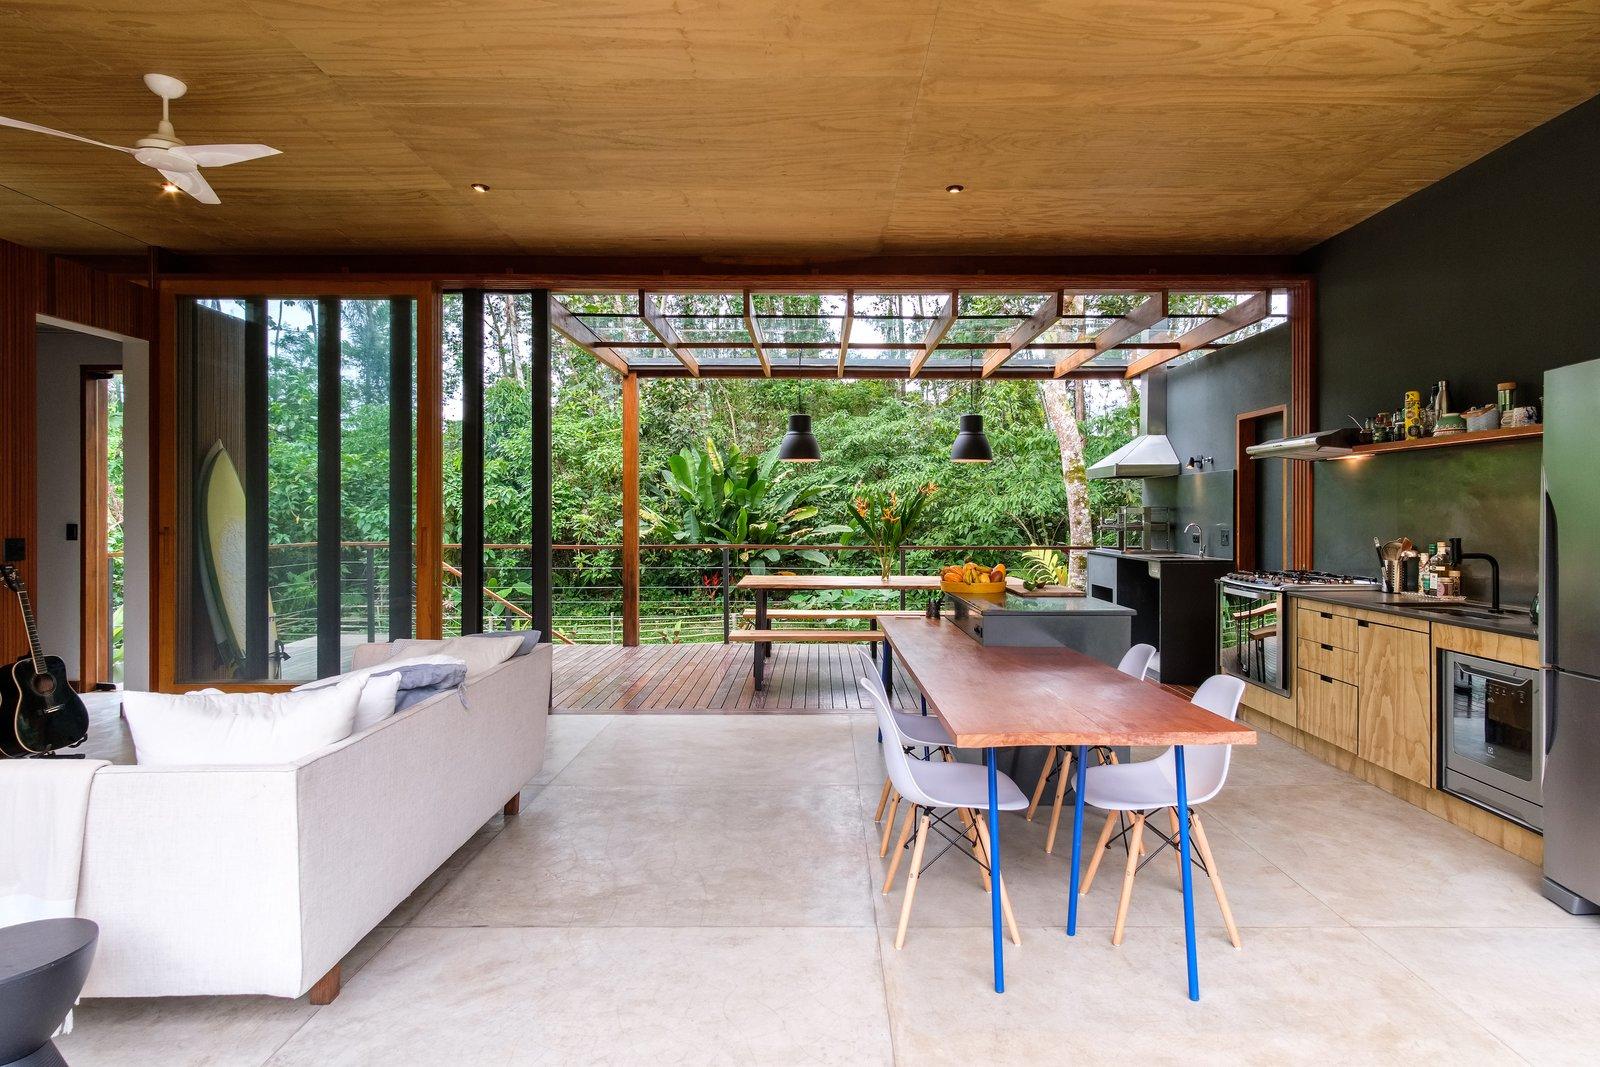 Casa Modelo living area